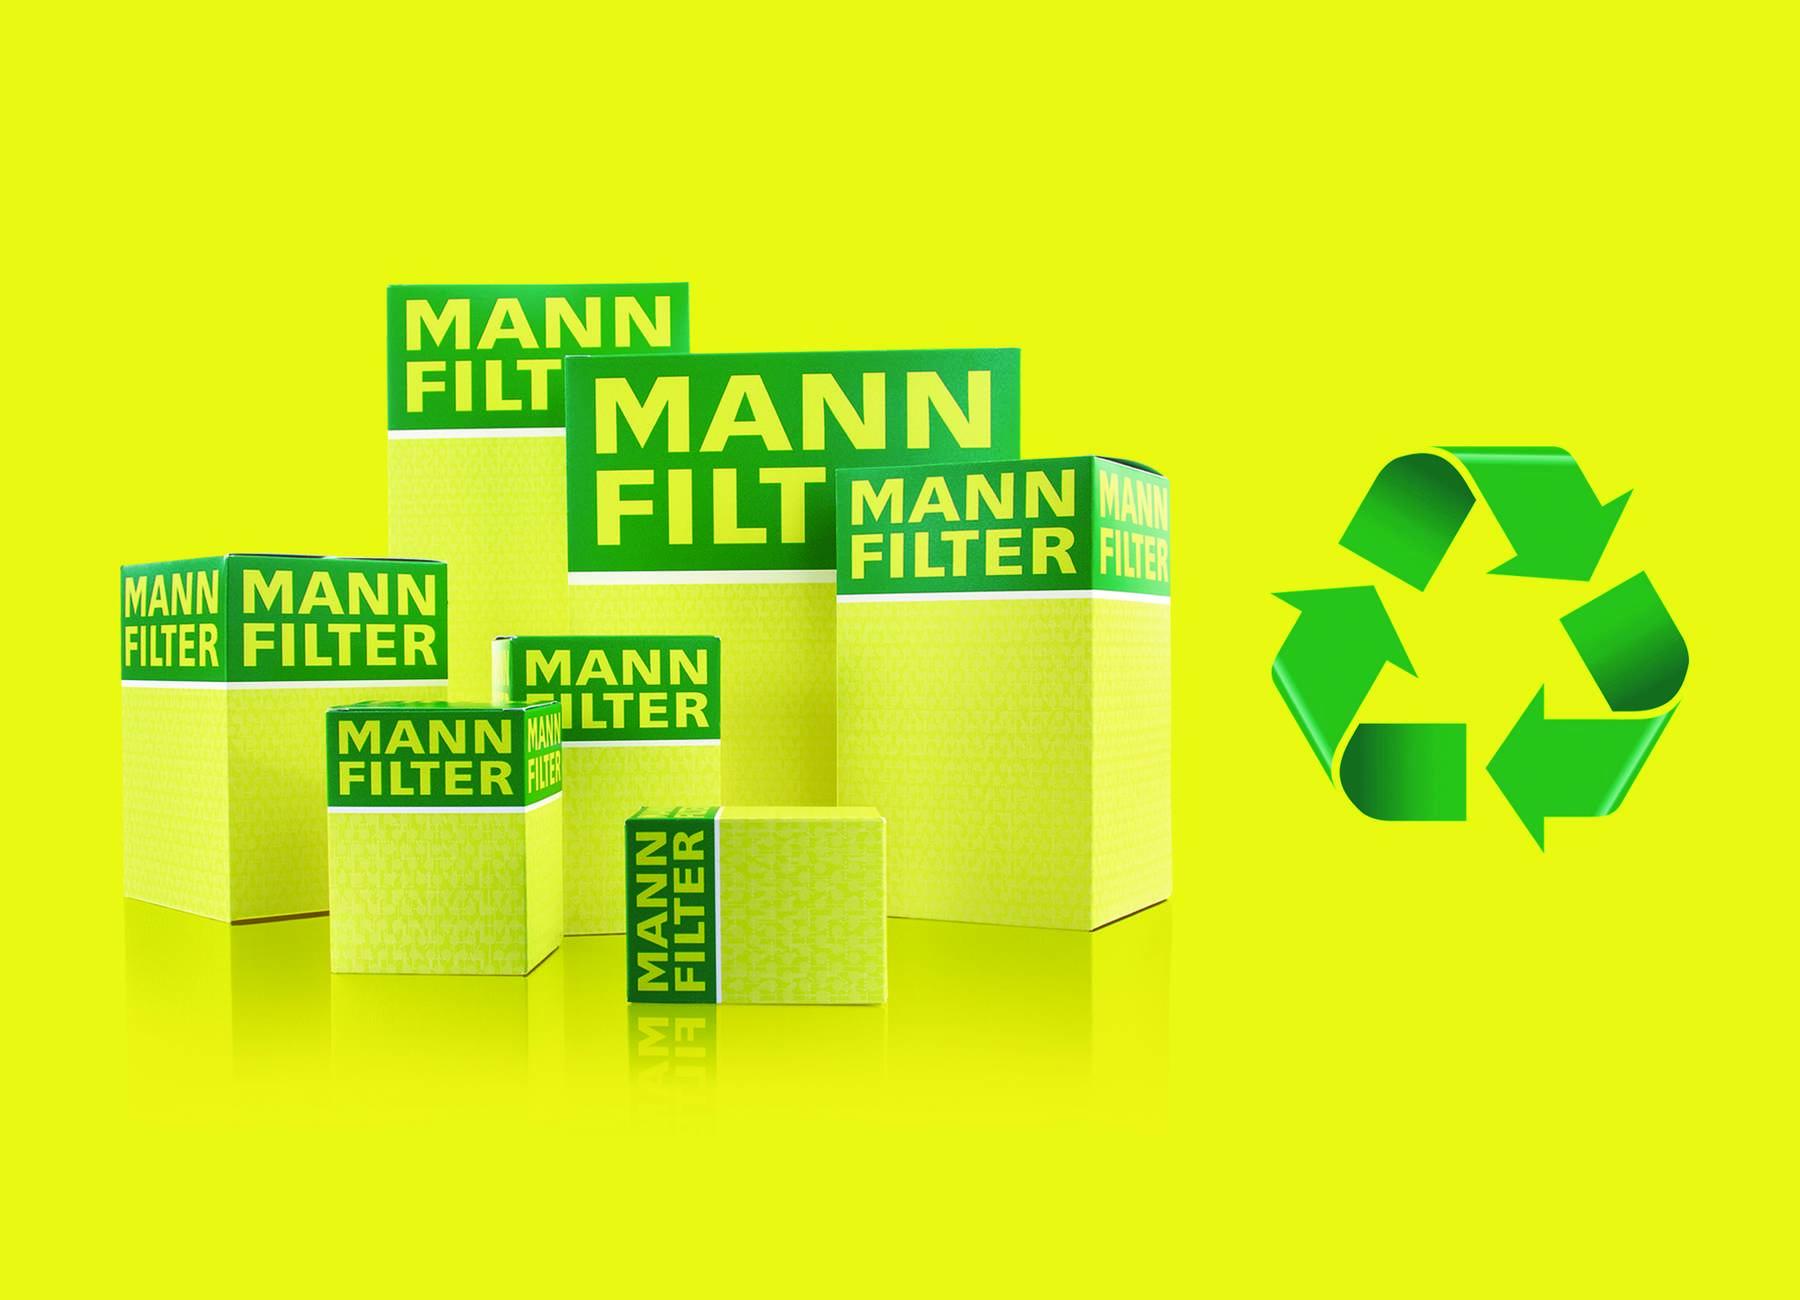 Schachteln_Recyclingfasern_MF_RGB_0220_MHDE.jpg